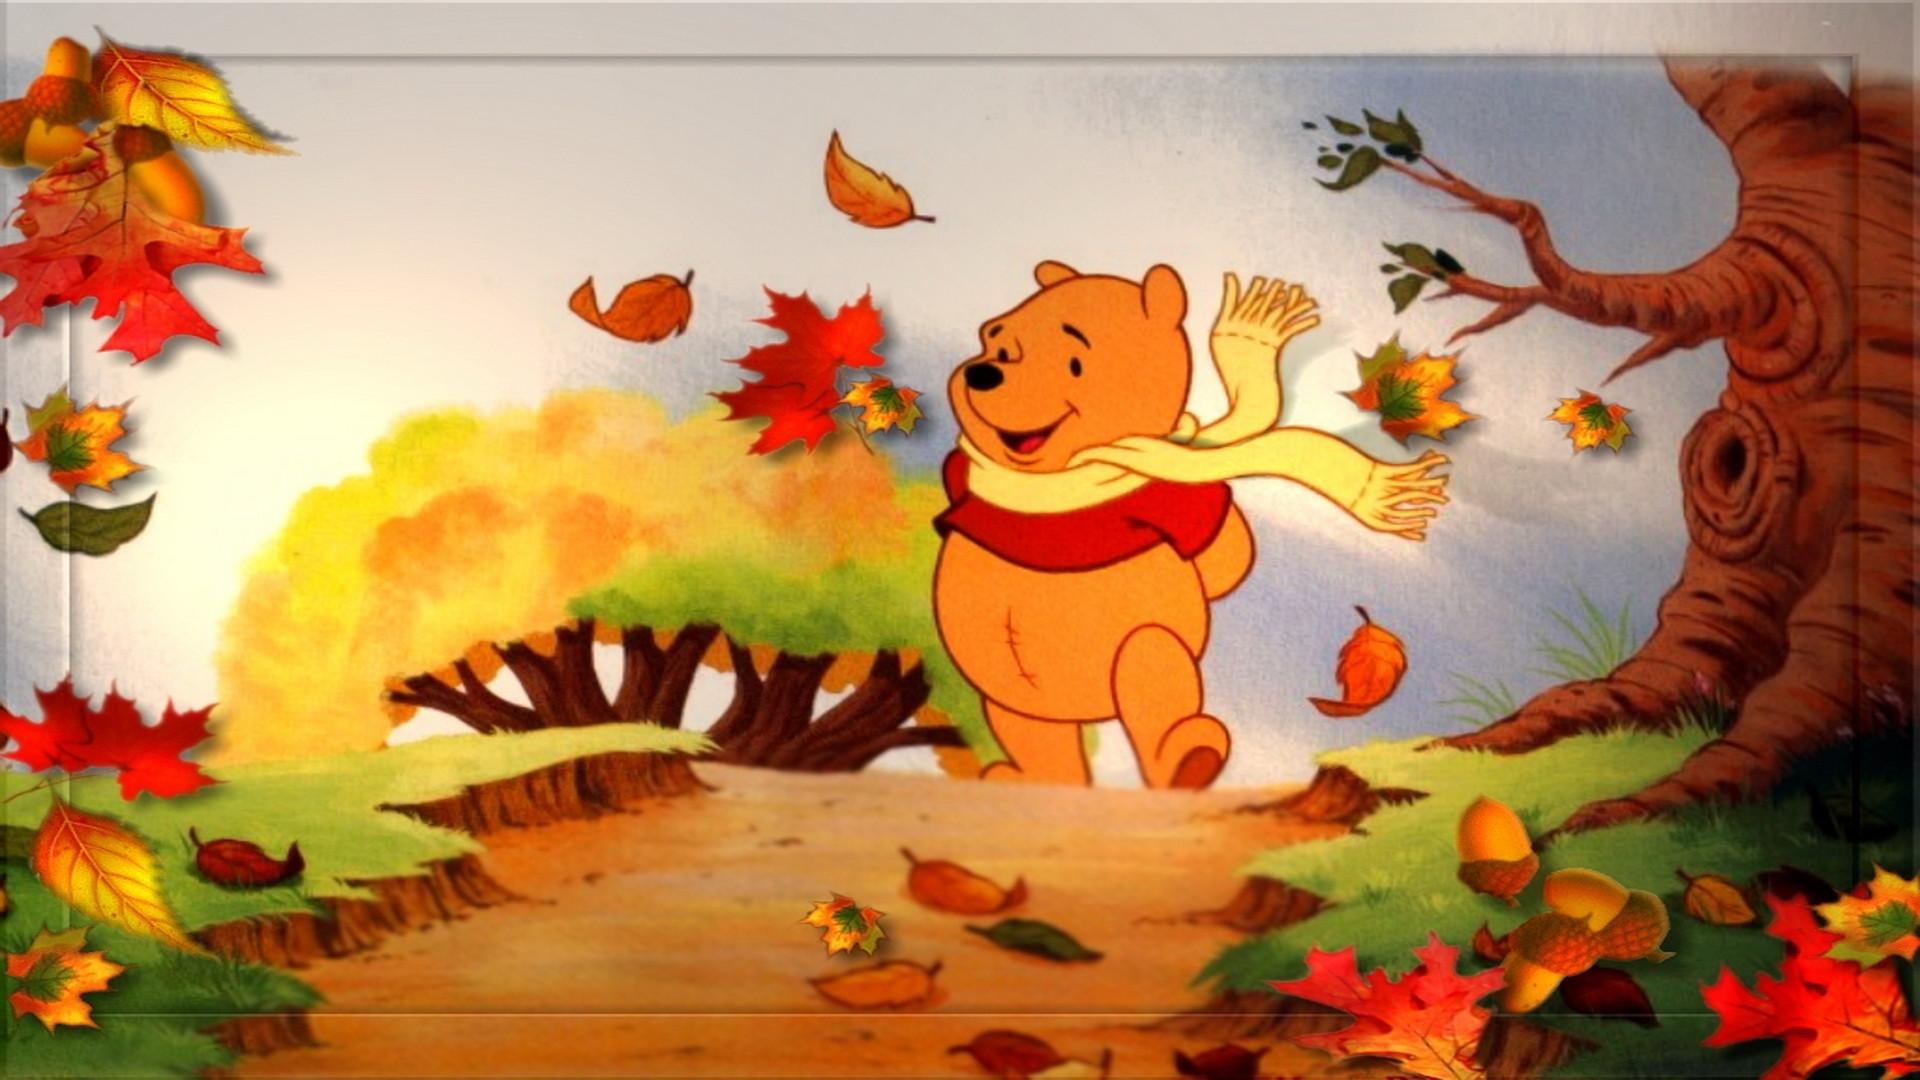 Thanksgiving desktop wallpapers backgrounds 58 images - Thanksgiving moving wallpaper ...